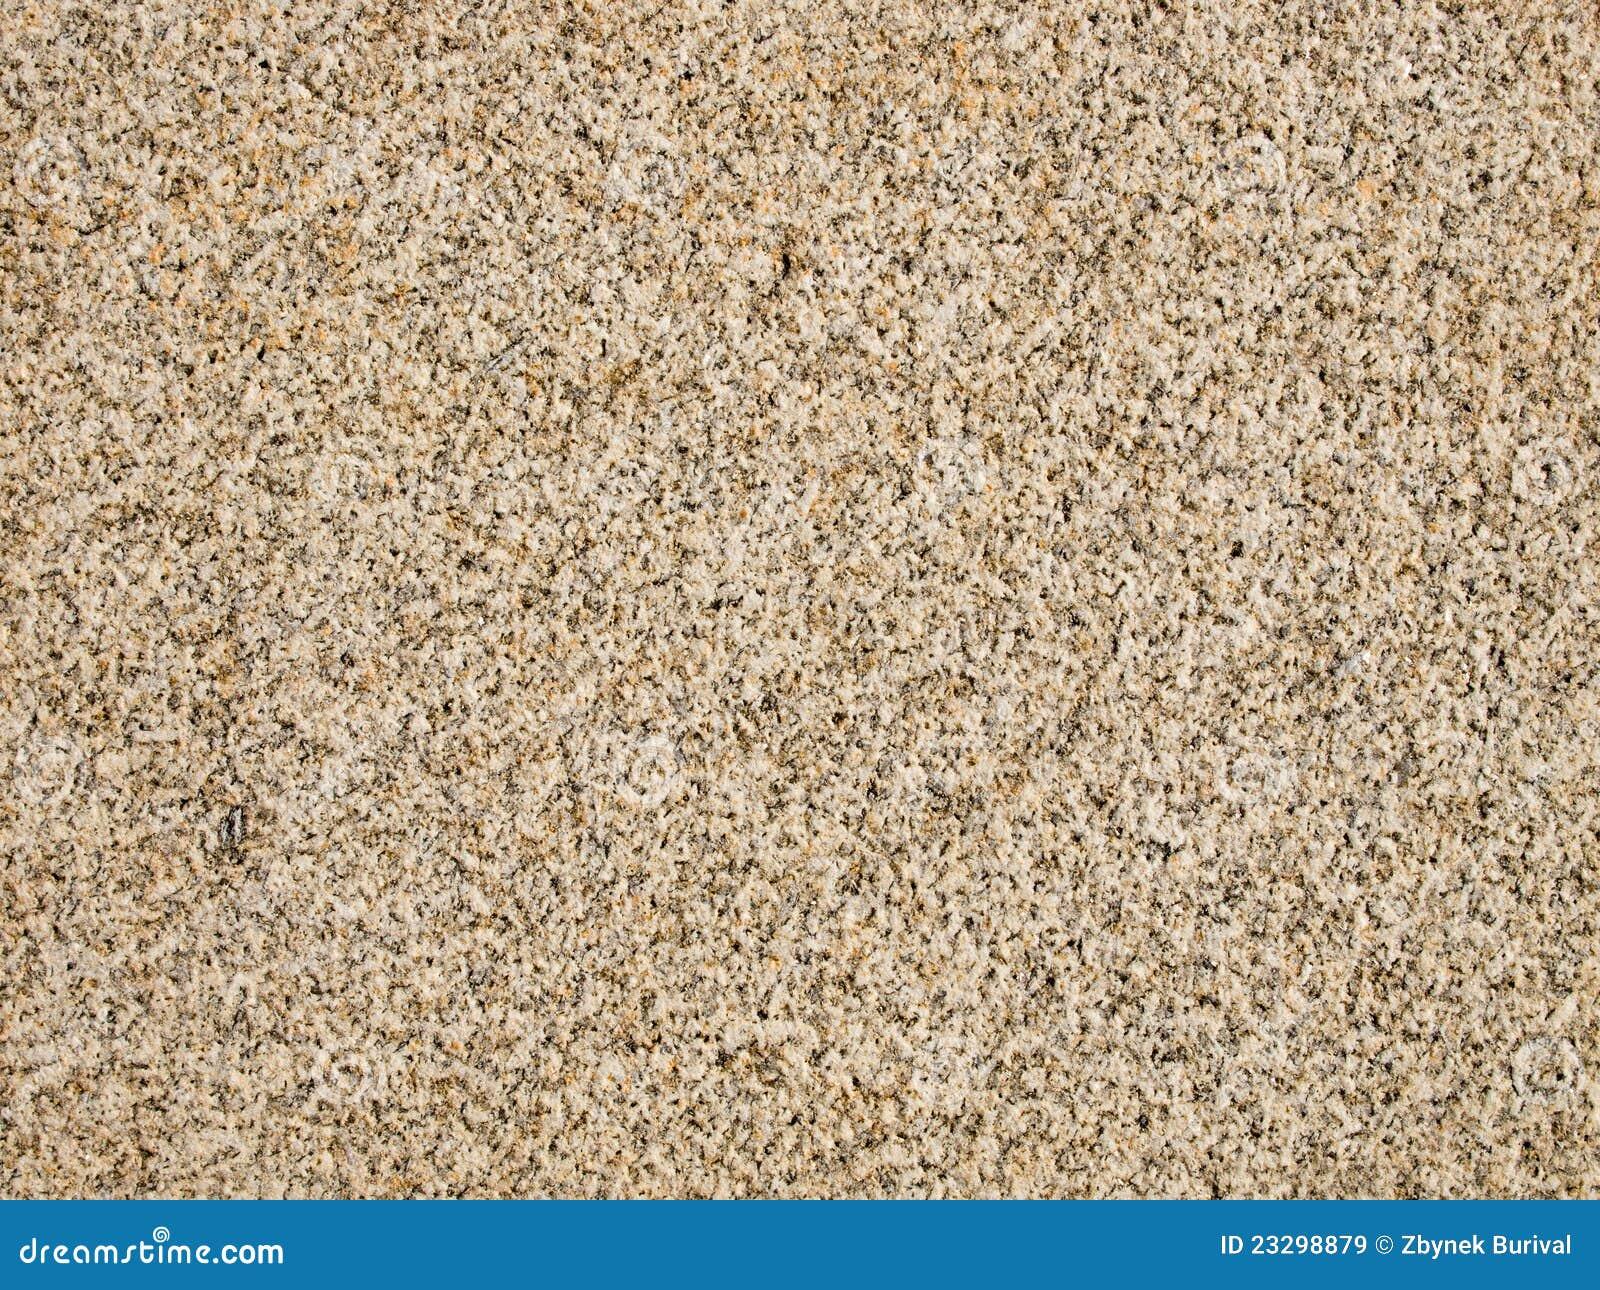 Rough granite texture stock image image of granitic for Photo de granite